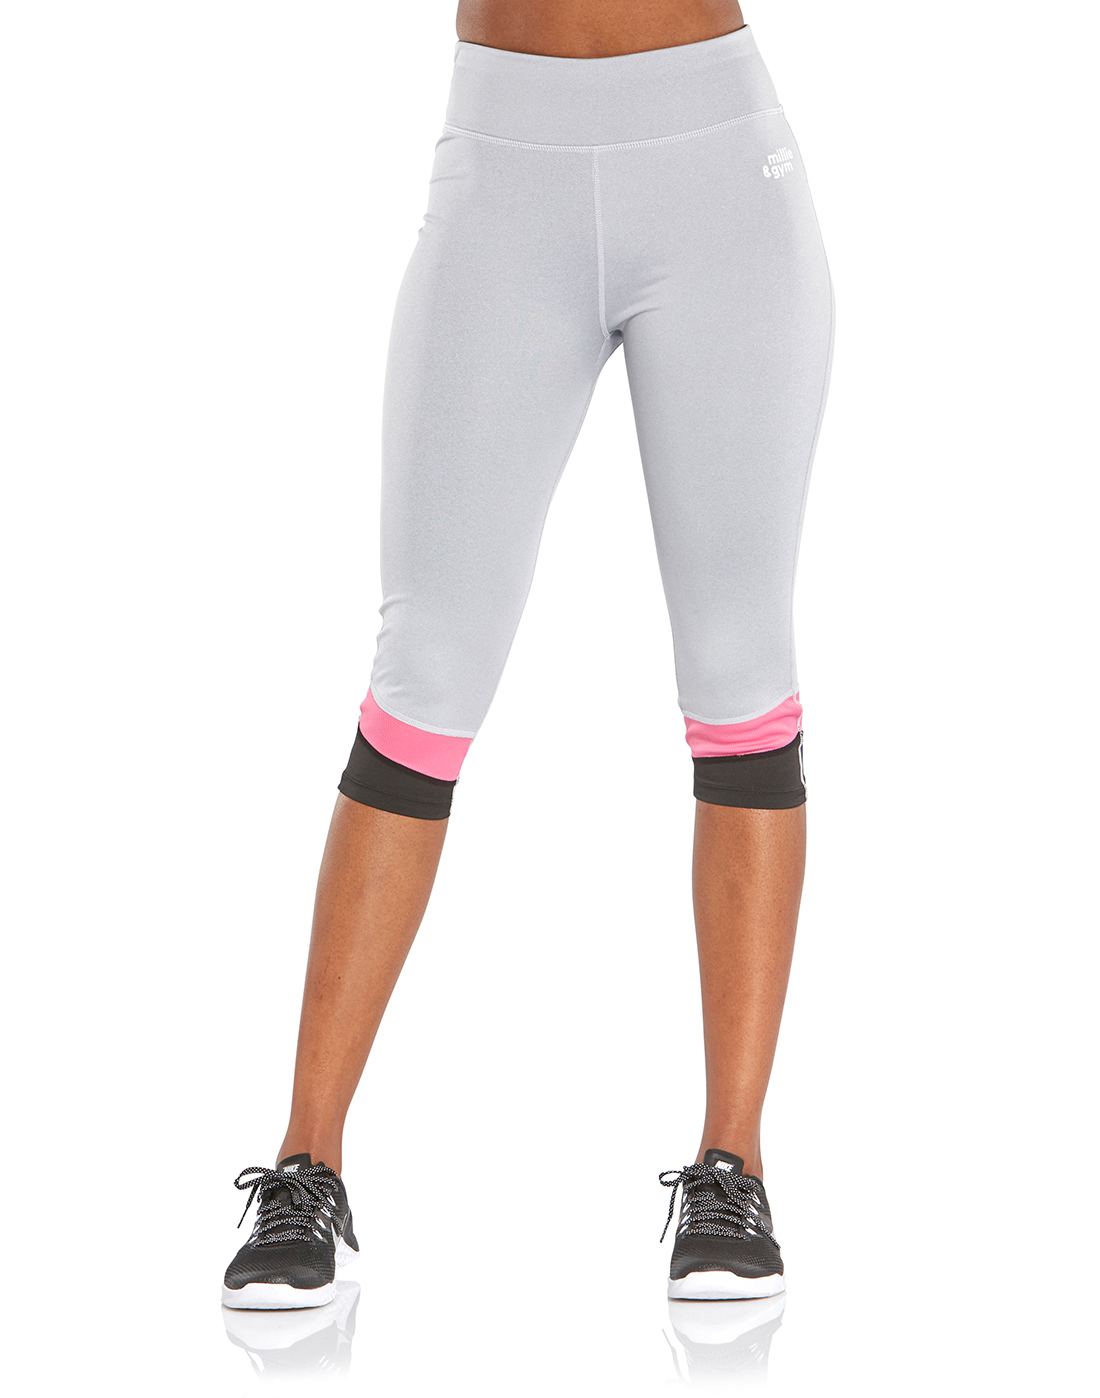 522d22fa13241 millie & gym Womens Pat Capri Leggings | Life Style Sports